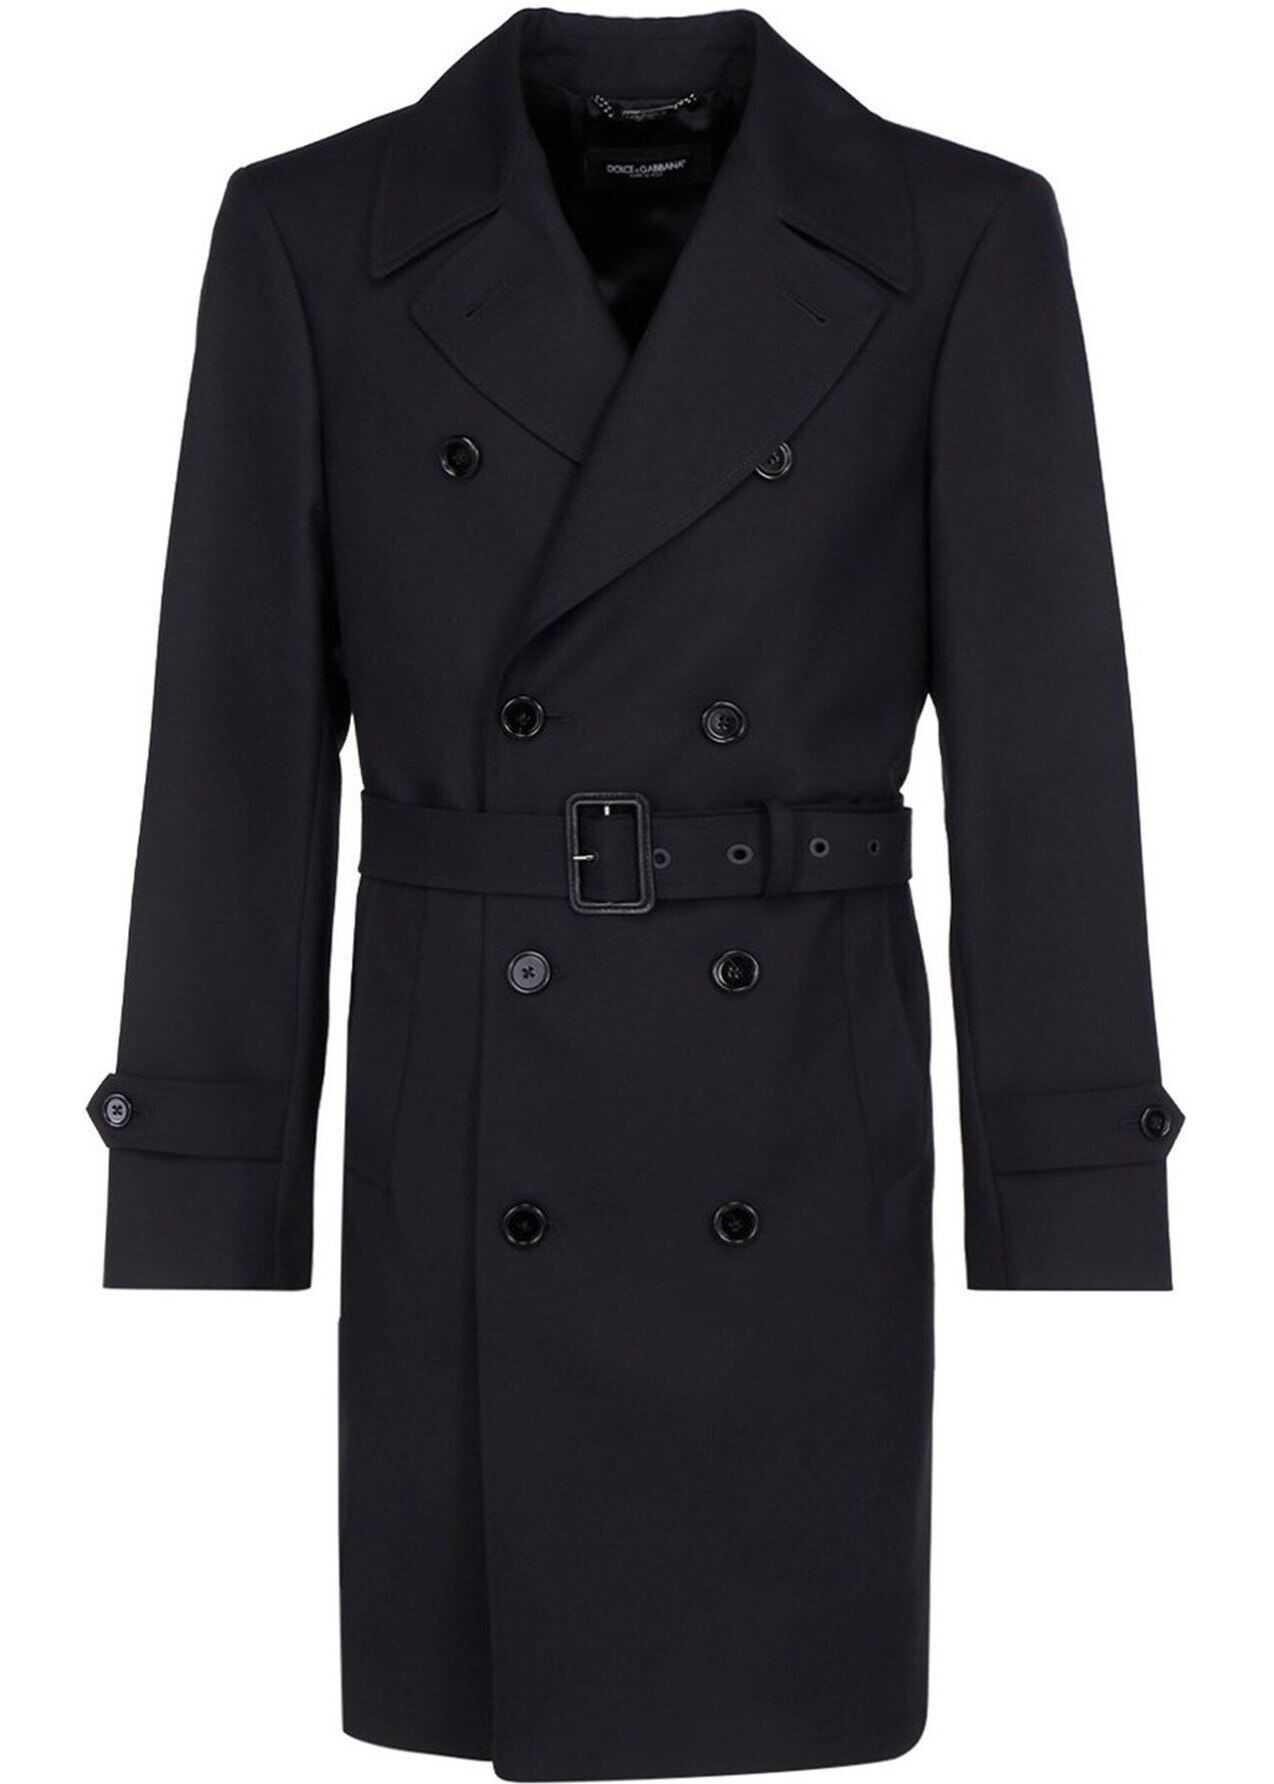 Dolce & Gabbana Wool Blend Trench Coat In Black Black imagine